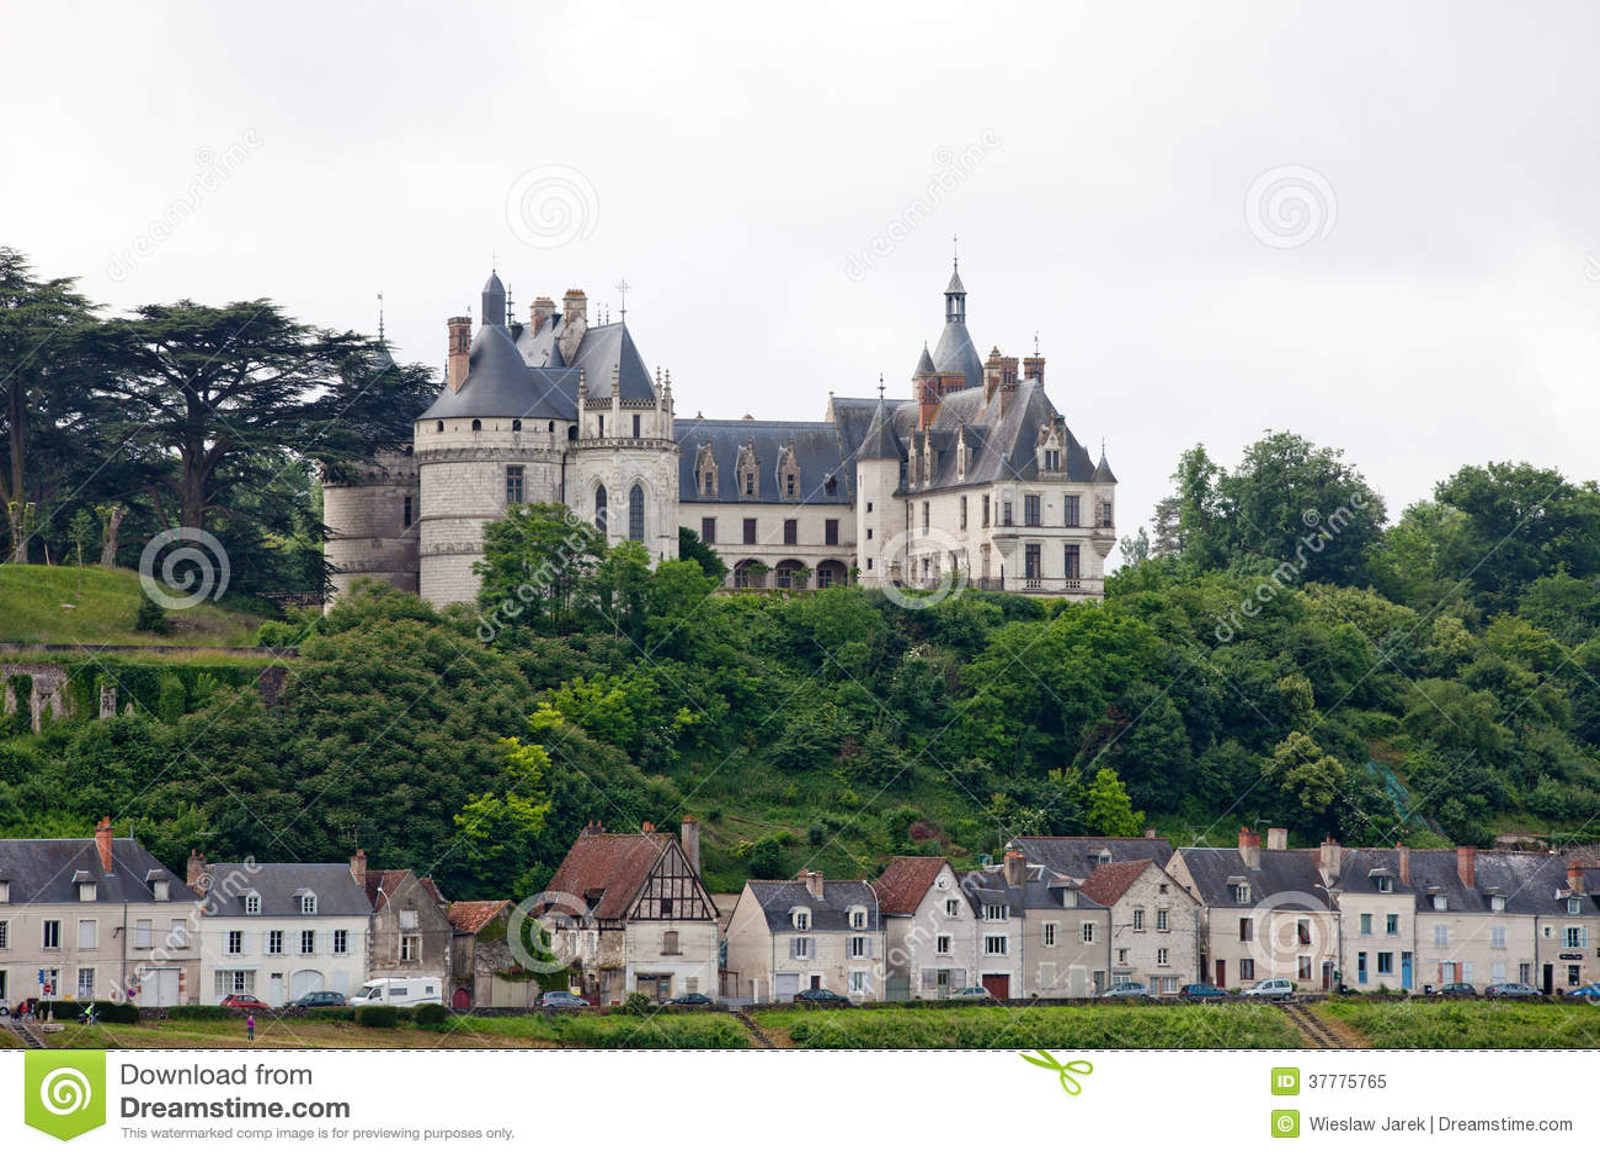 Chaumont-sur-Loirekasteel.